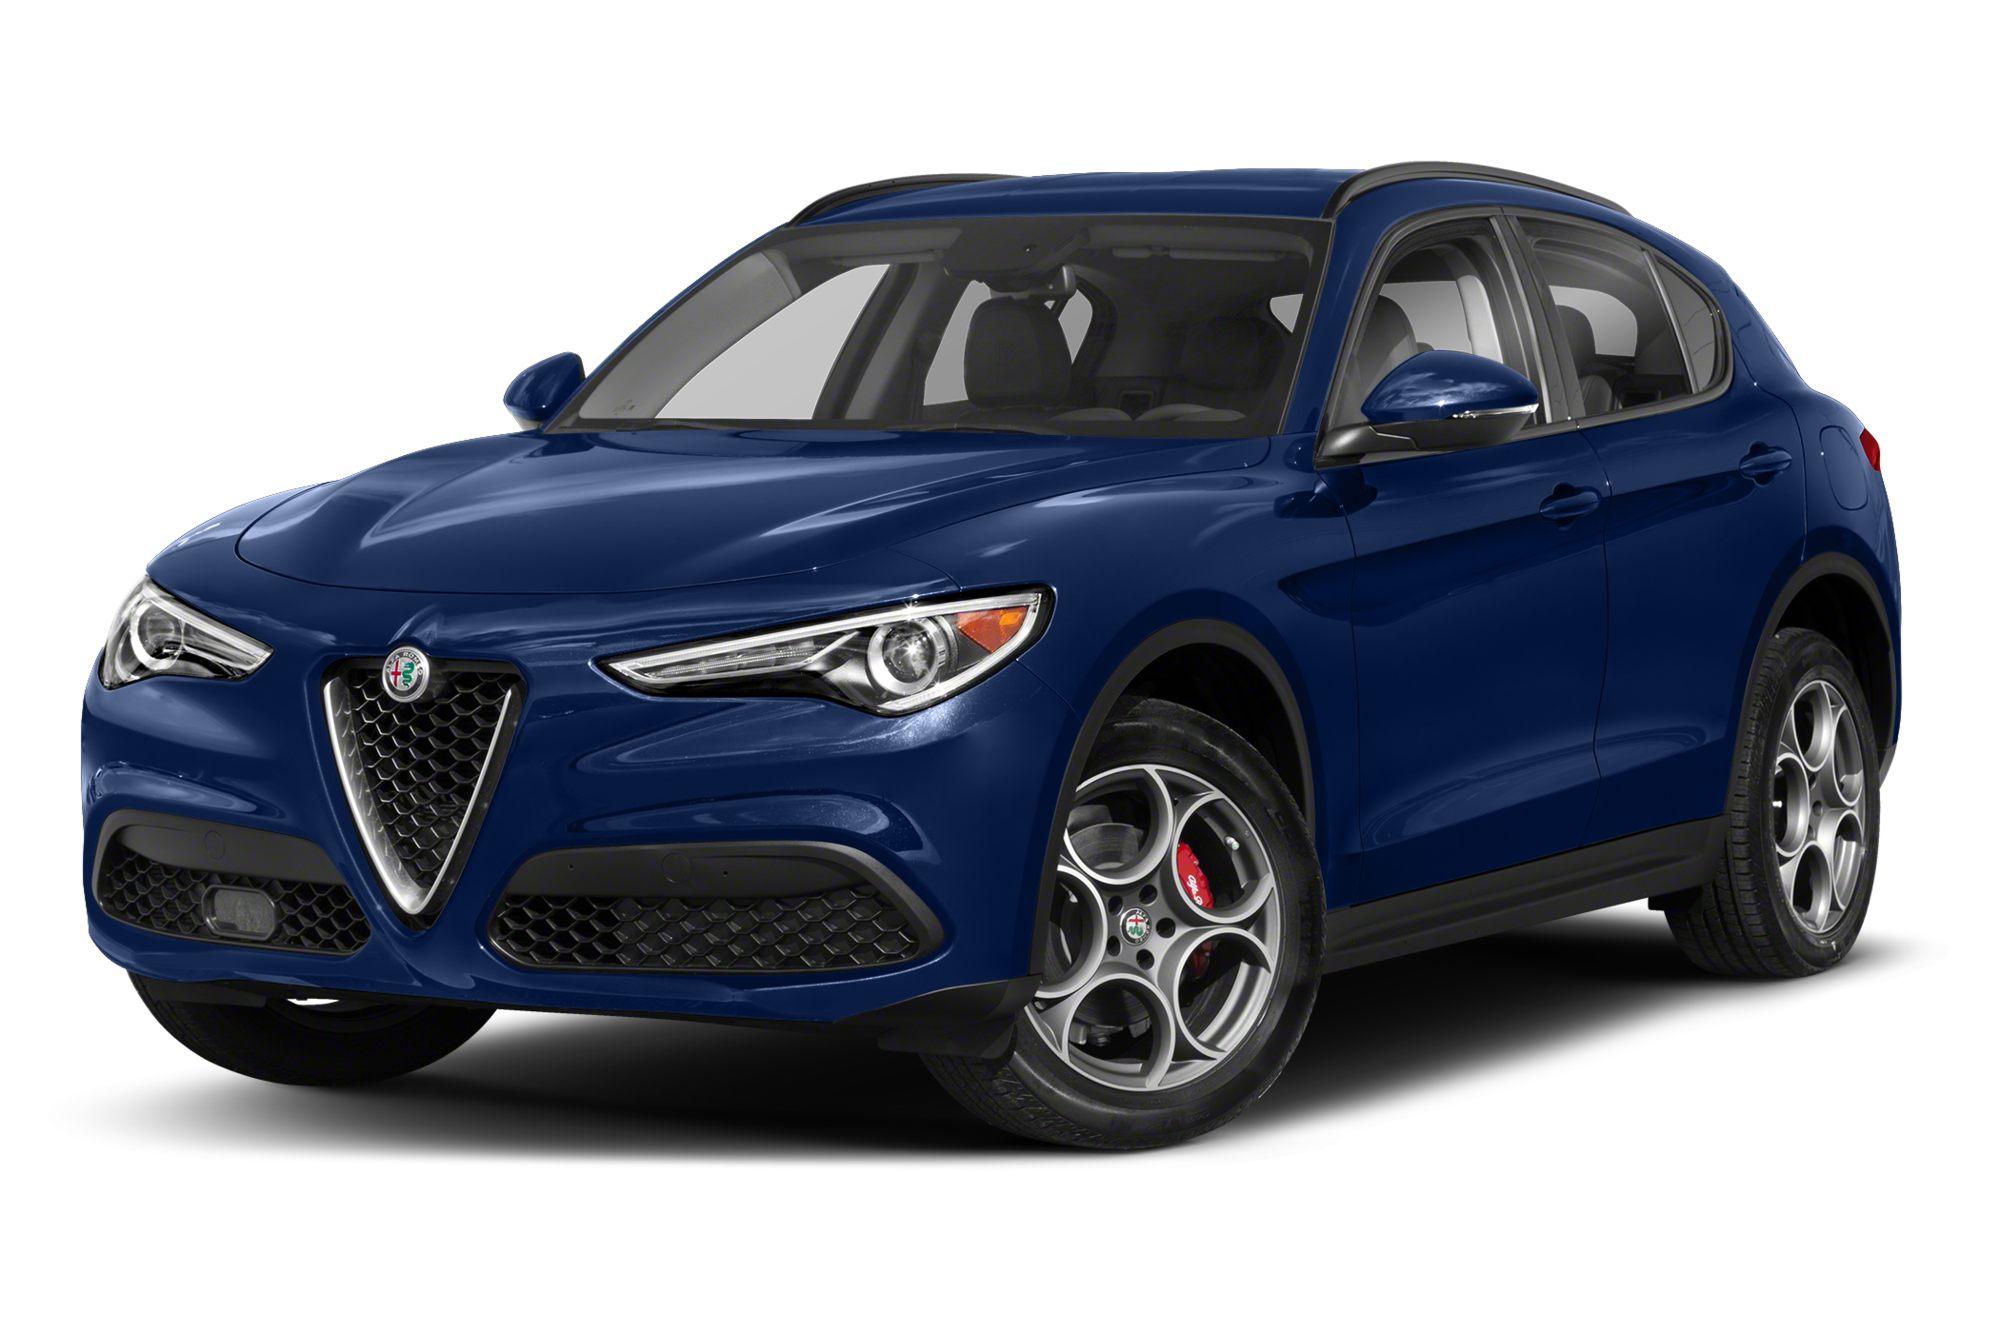 2018-2019 Alfa Romeo Giulia and Stelvio: Recall Alert